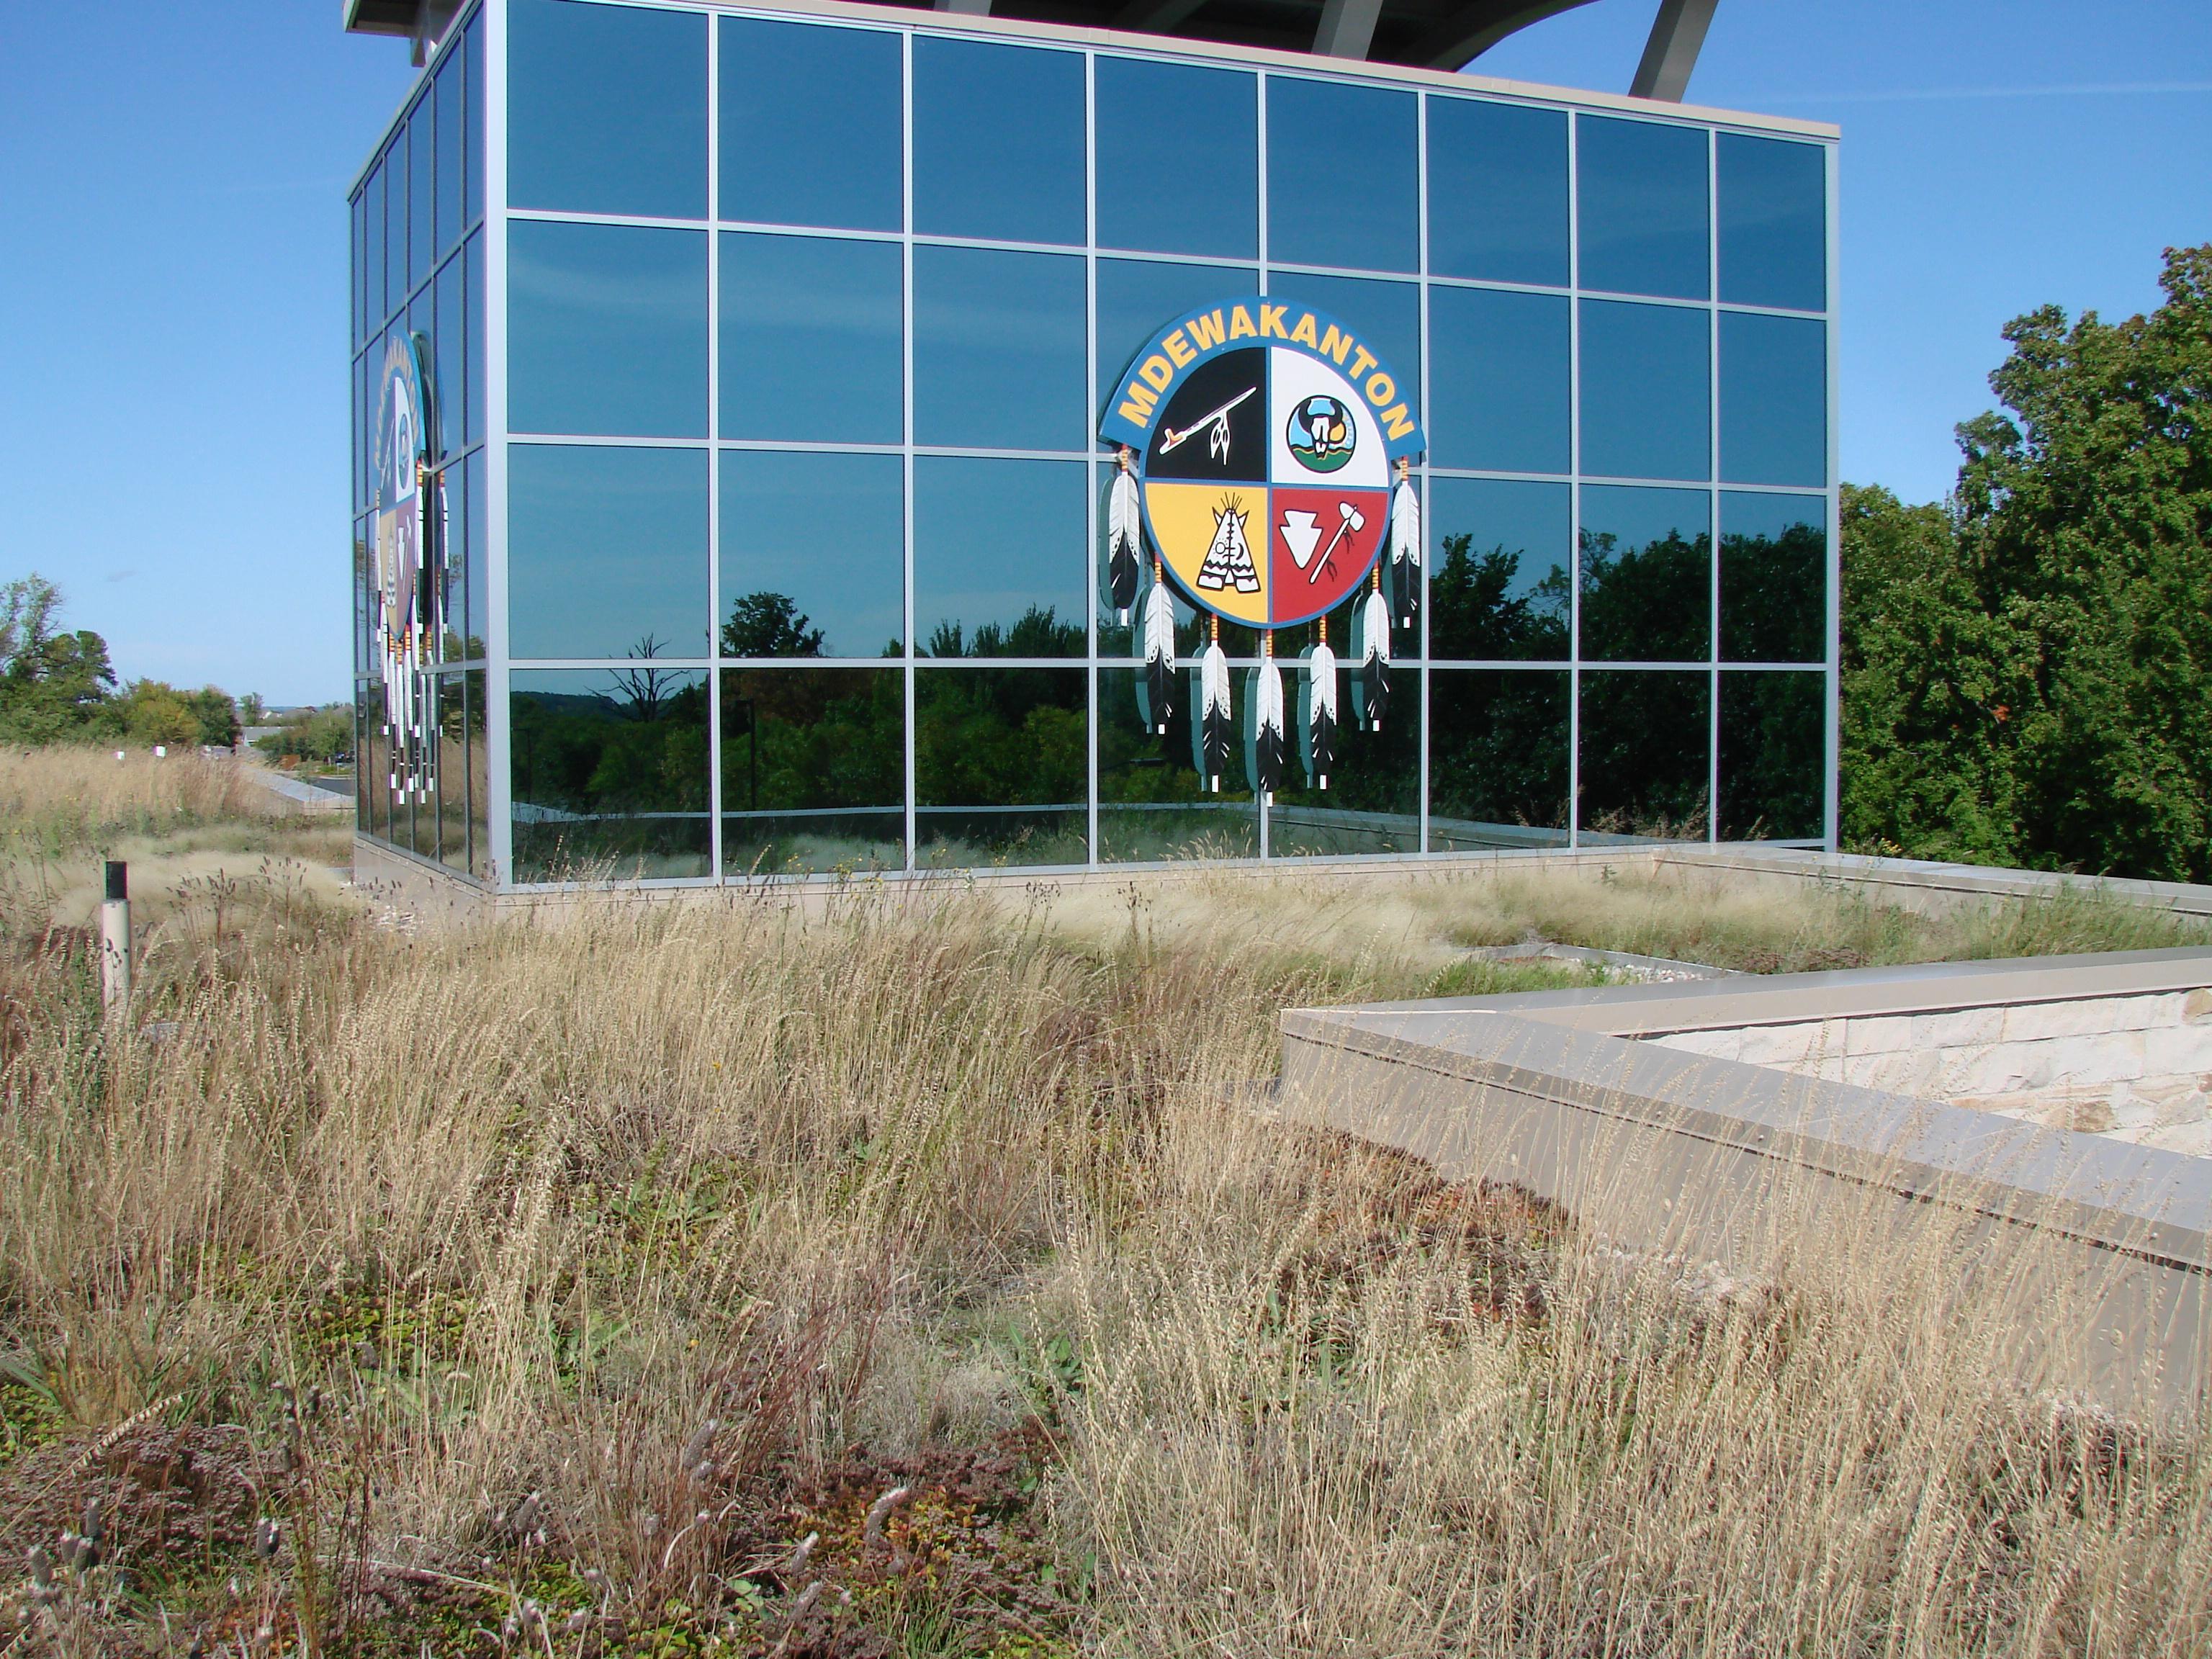 Mystic Lake - Water Treatment Center